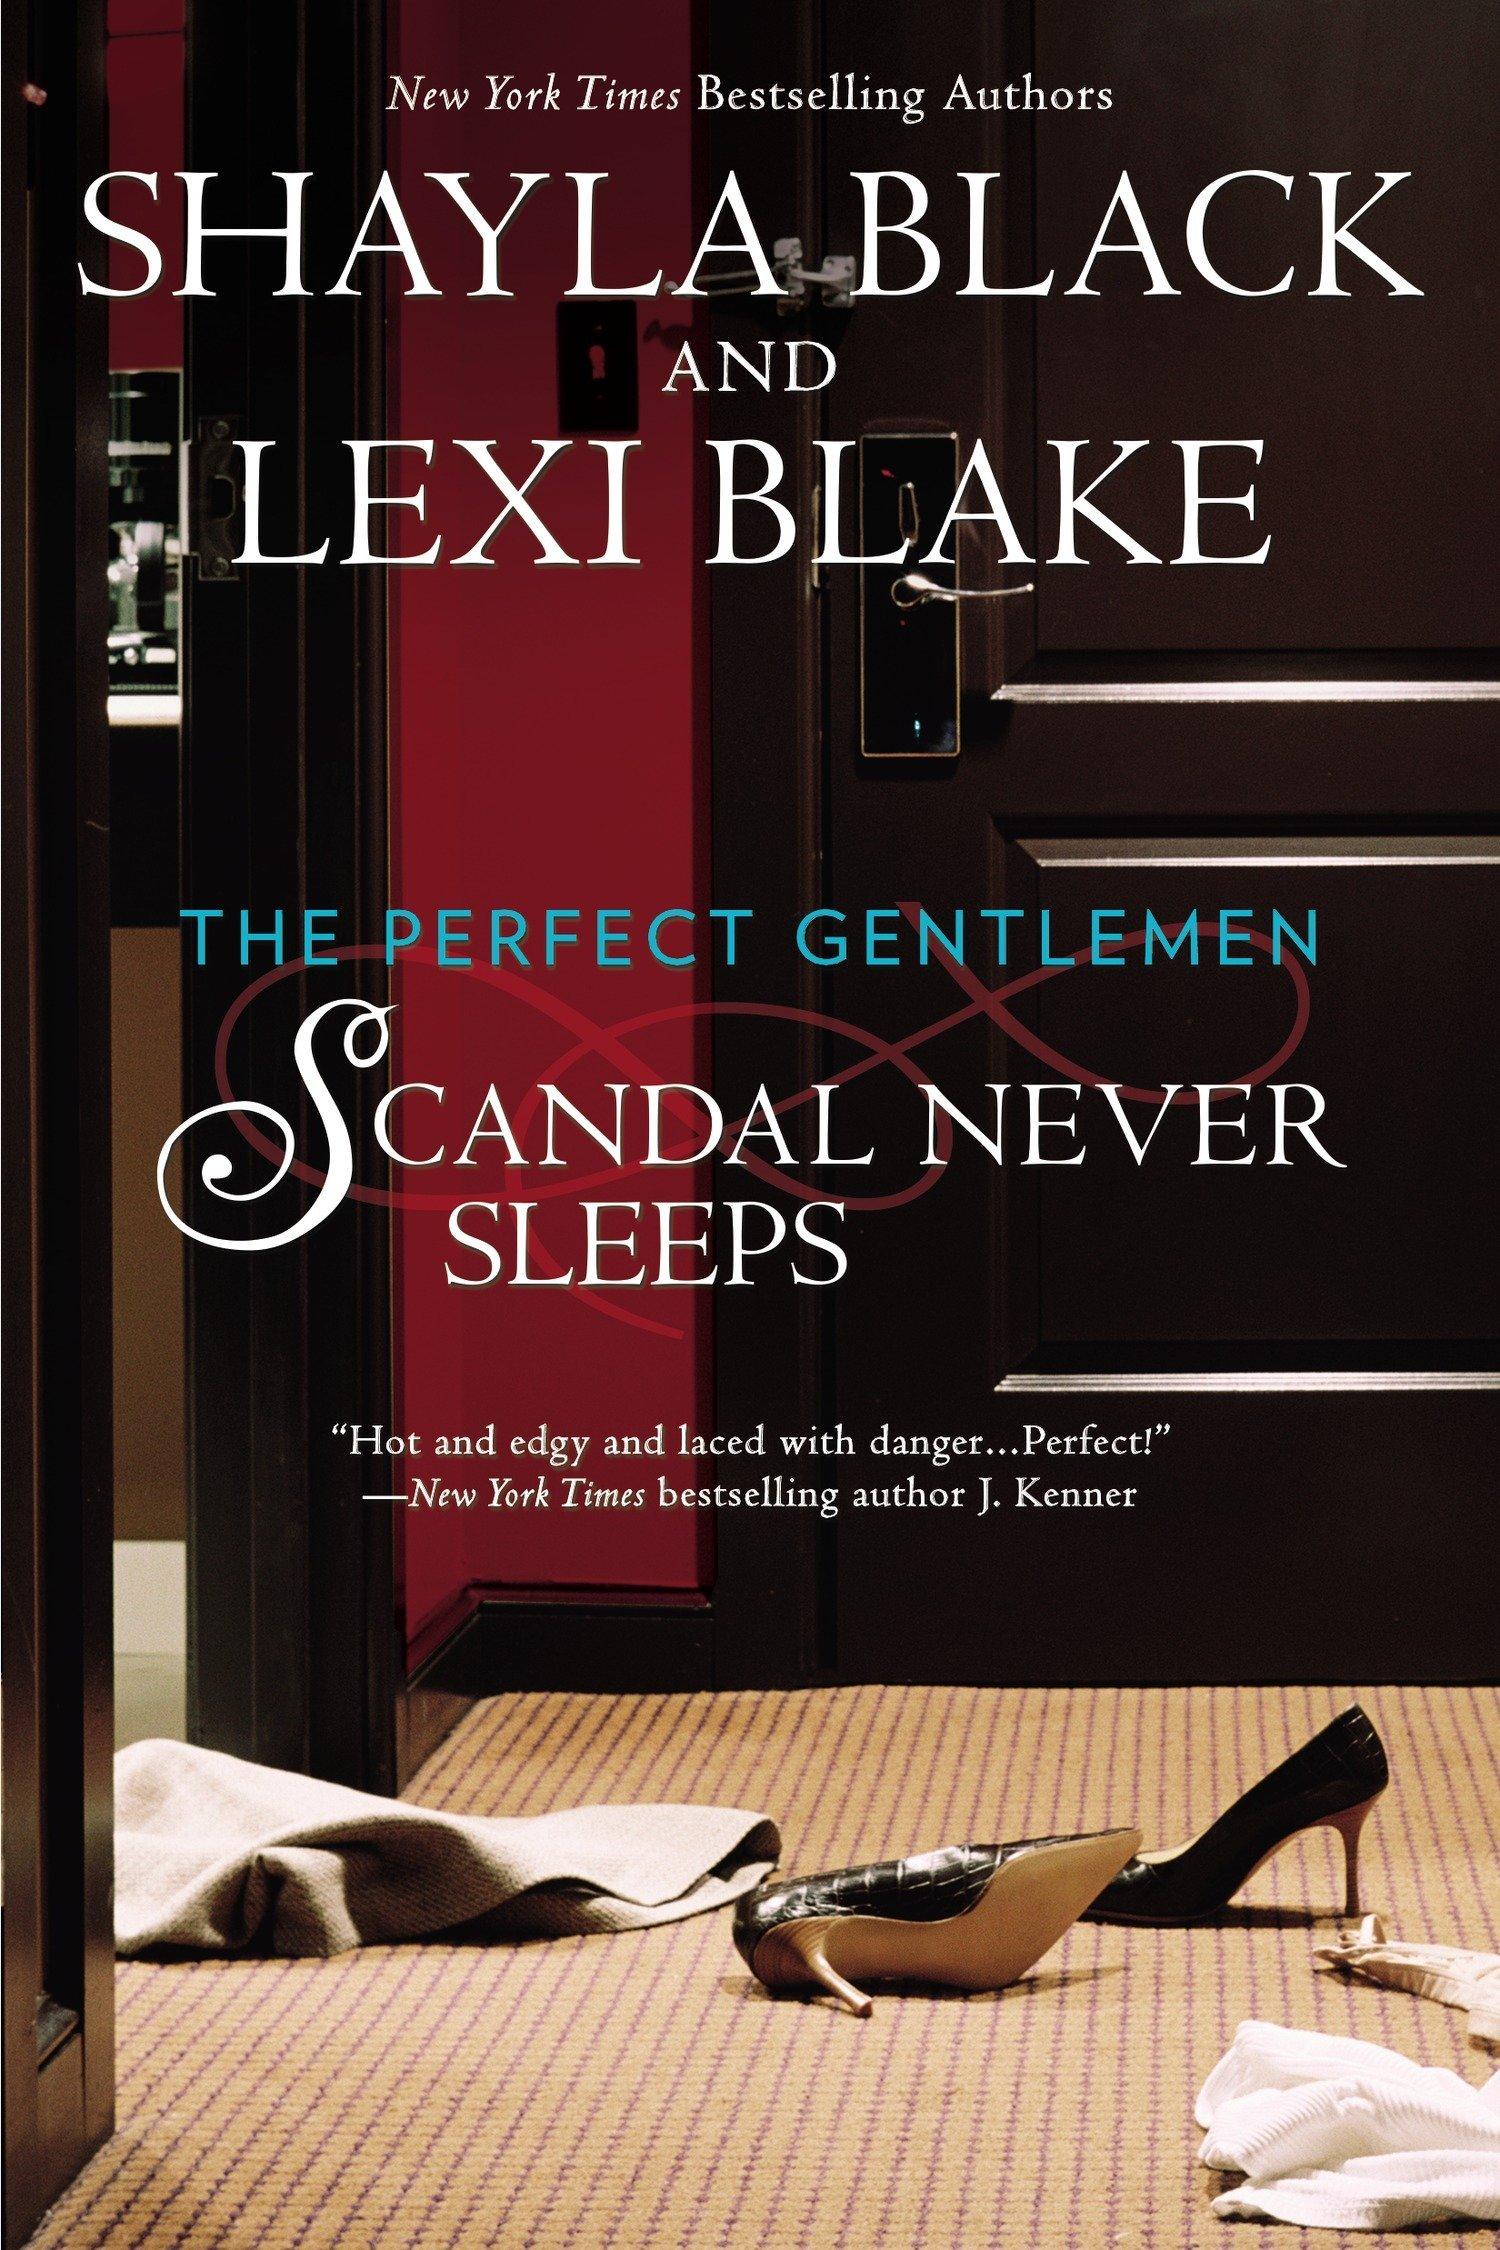 83a387d75 Scandal Never Sleeps - Livros na Amazon Brasil- 9780425275320